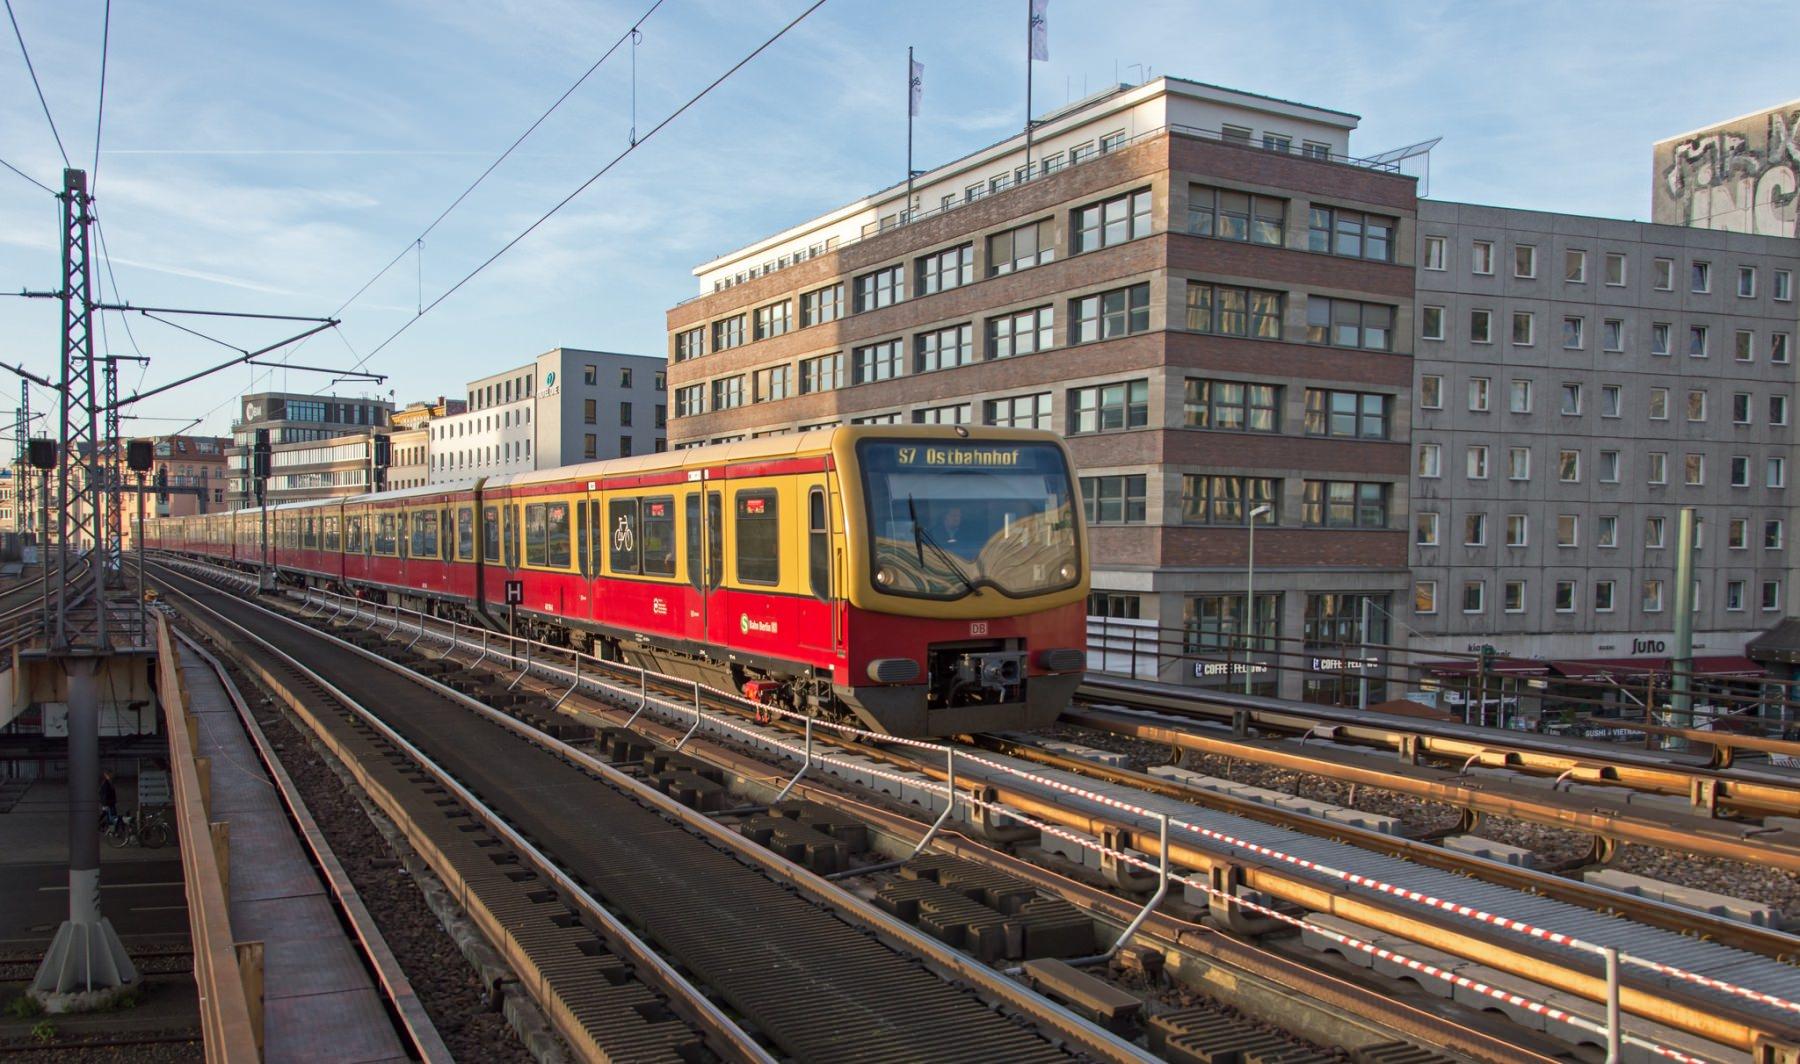 Alexanderplatz S-Bahn Berlin S7 Stadtbahn